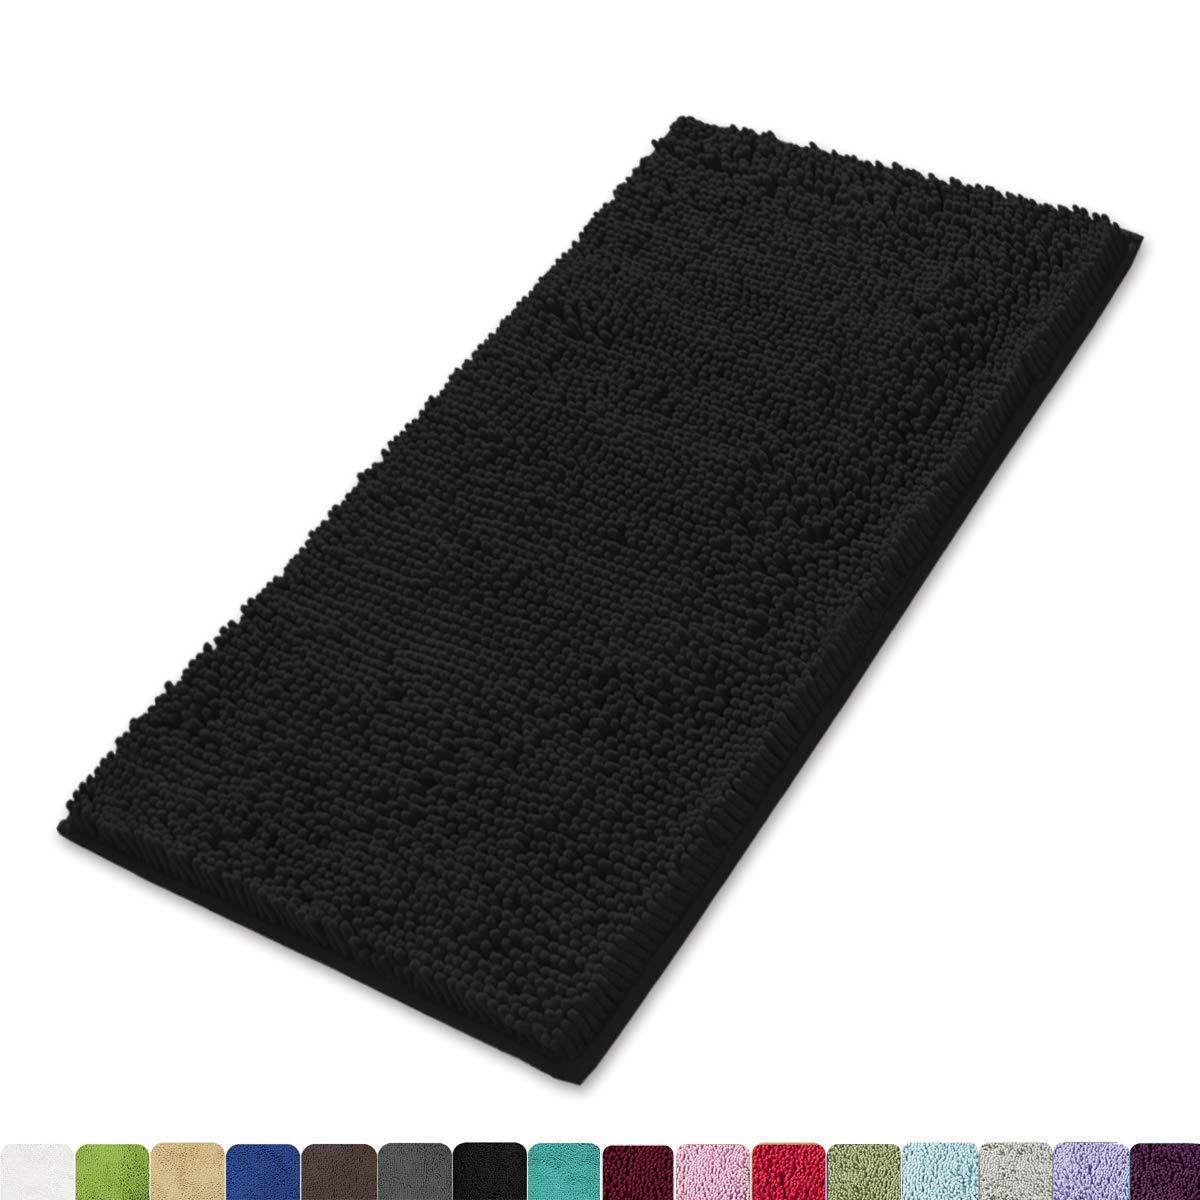 MAYSHINE Non-Slip Bathroom Rug Shag Shower Mat (24x39 Inches) Machine-Washable Bath Mats Water Absorbent Soft Microfibers- Black